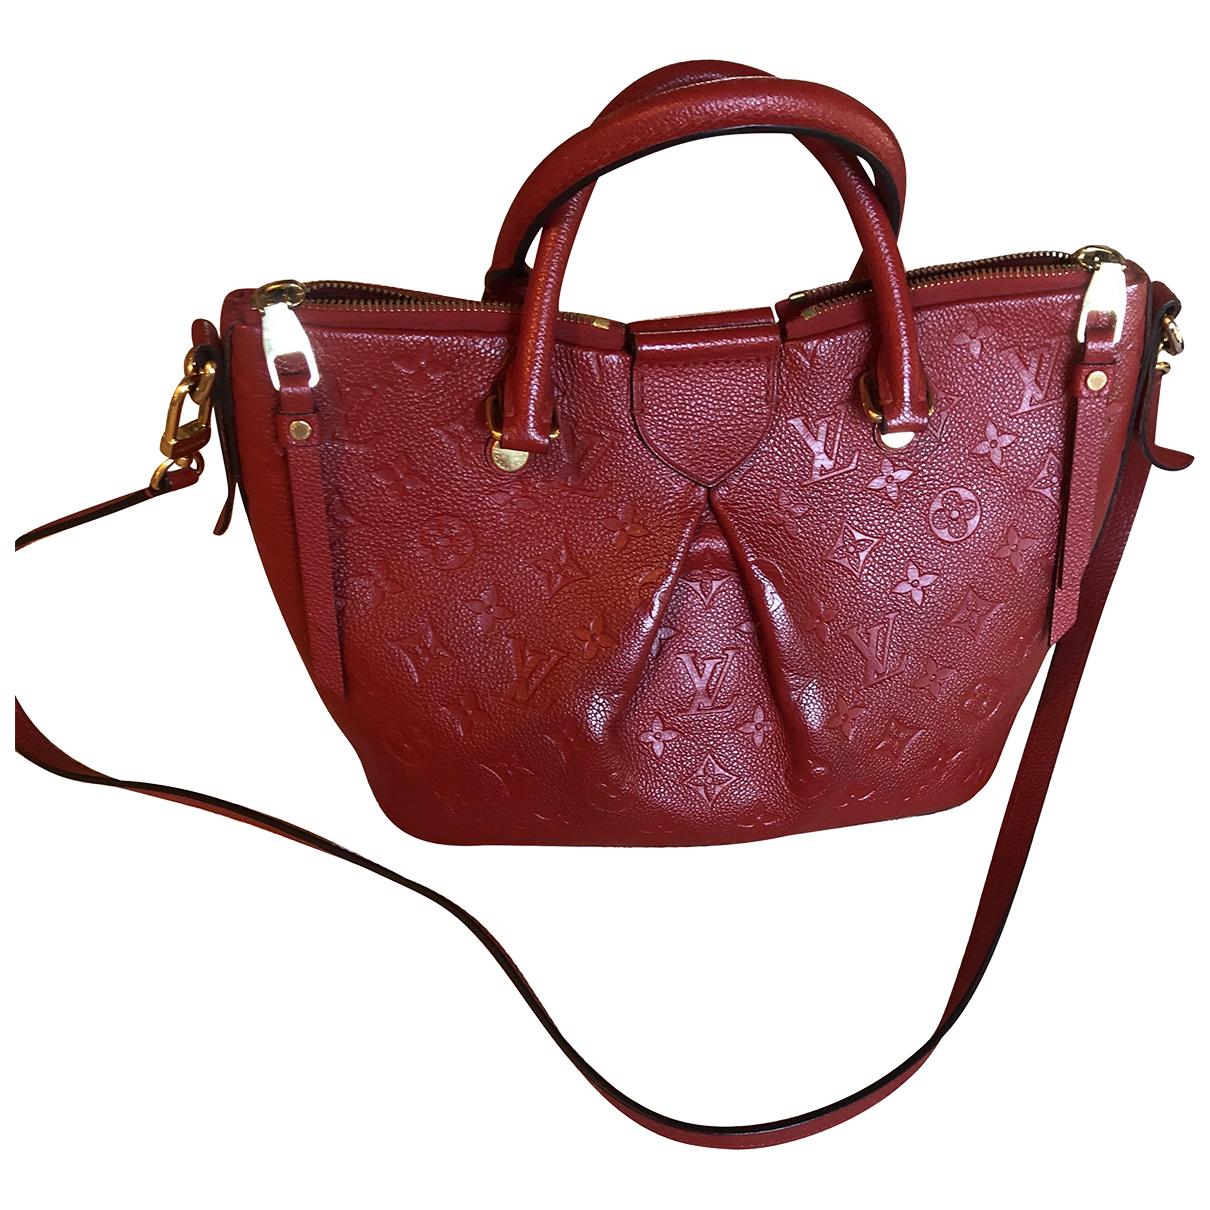 Louis Vuitton - Sac a main Mazarine pour femme en cuir - rouge